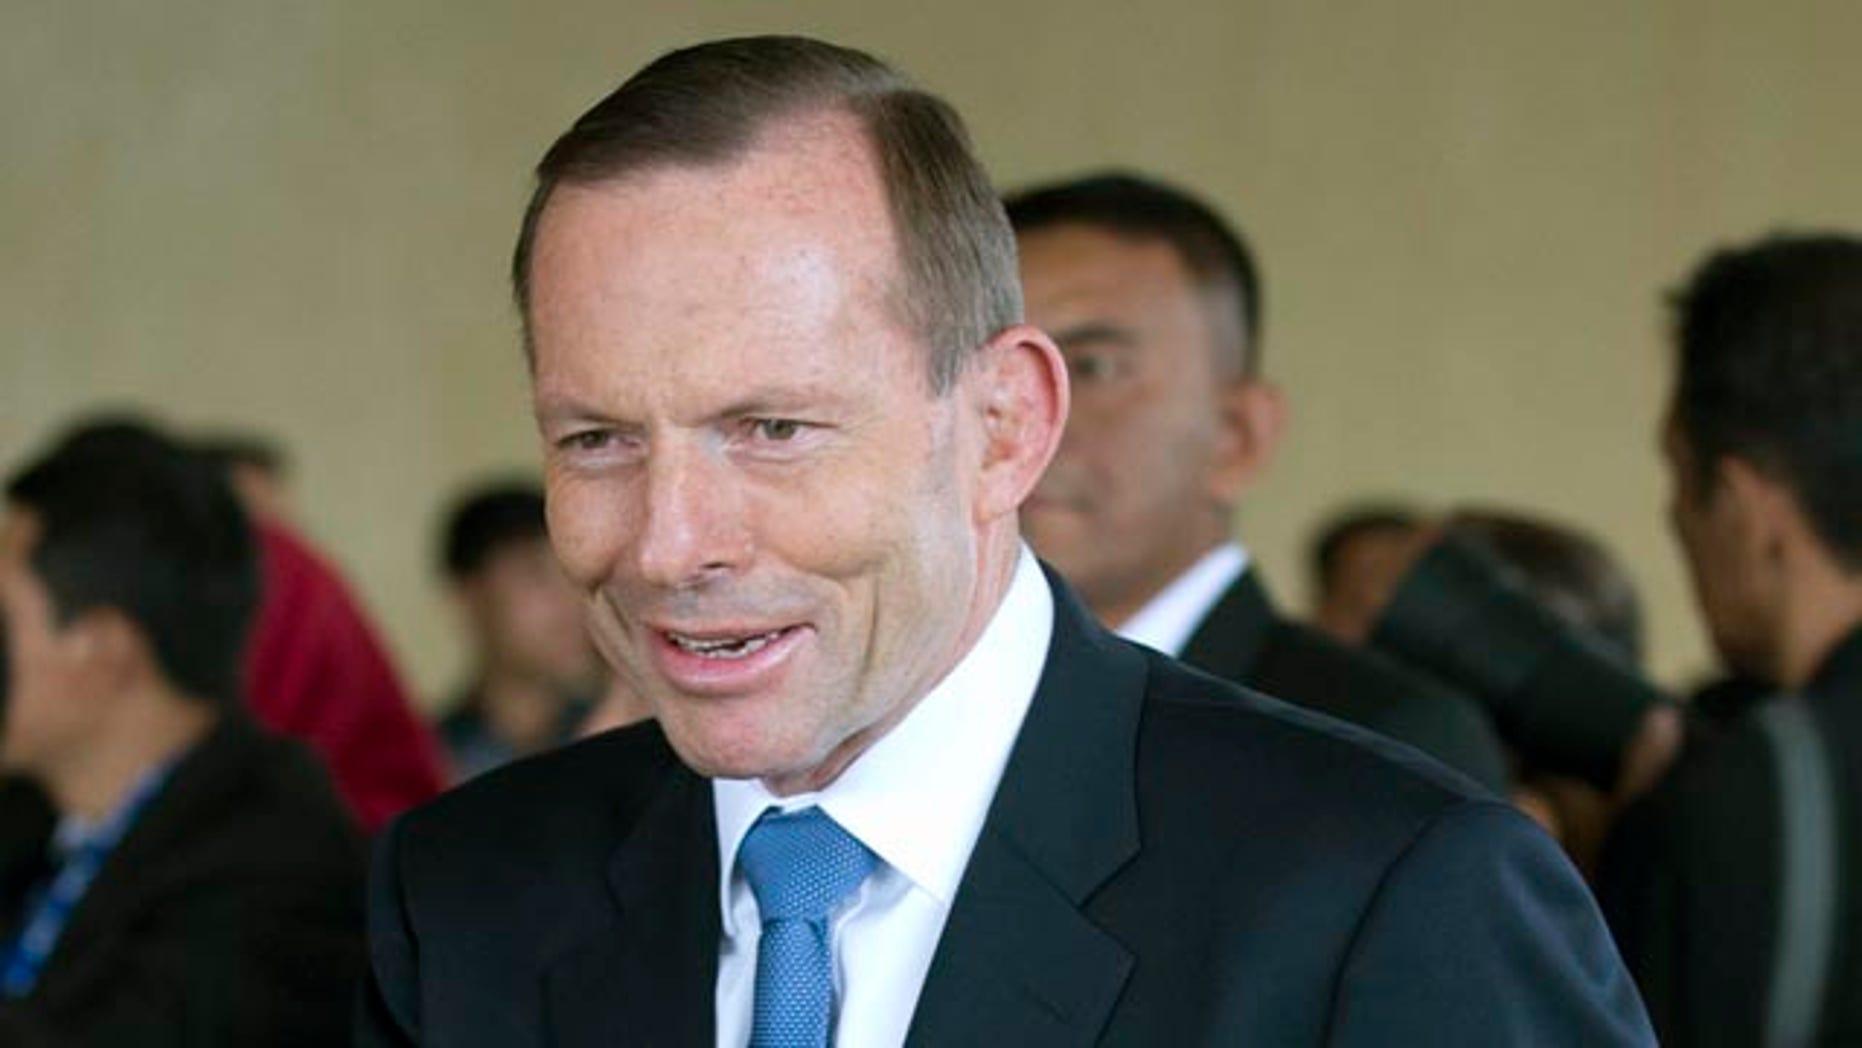 October 20, 2014: Australian Prime Minister Tony Abbott waves as he arrives for the inauguration of Indonesian President Joko Widodo at Parliament in Jakarta. (AP Photo/Mark Baker)